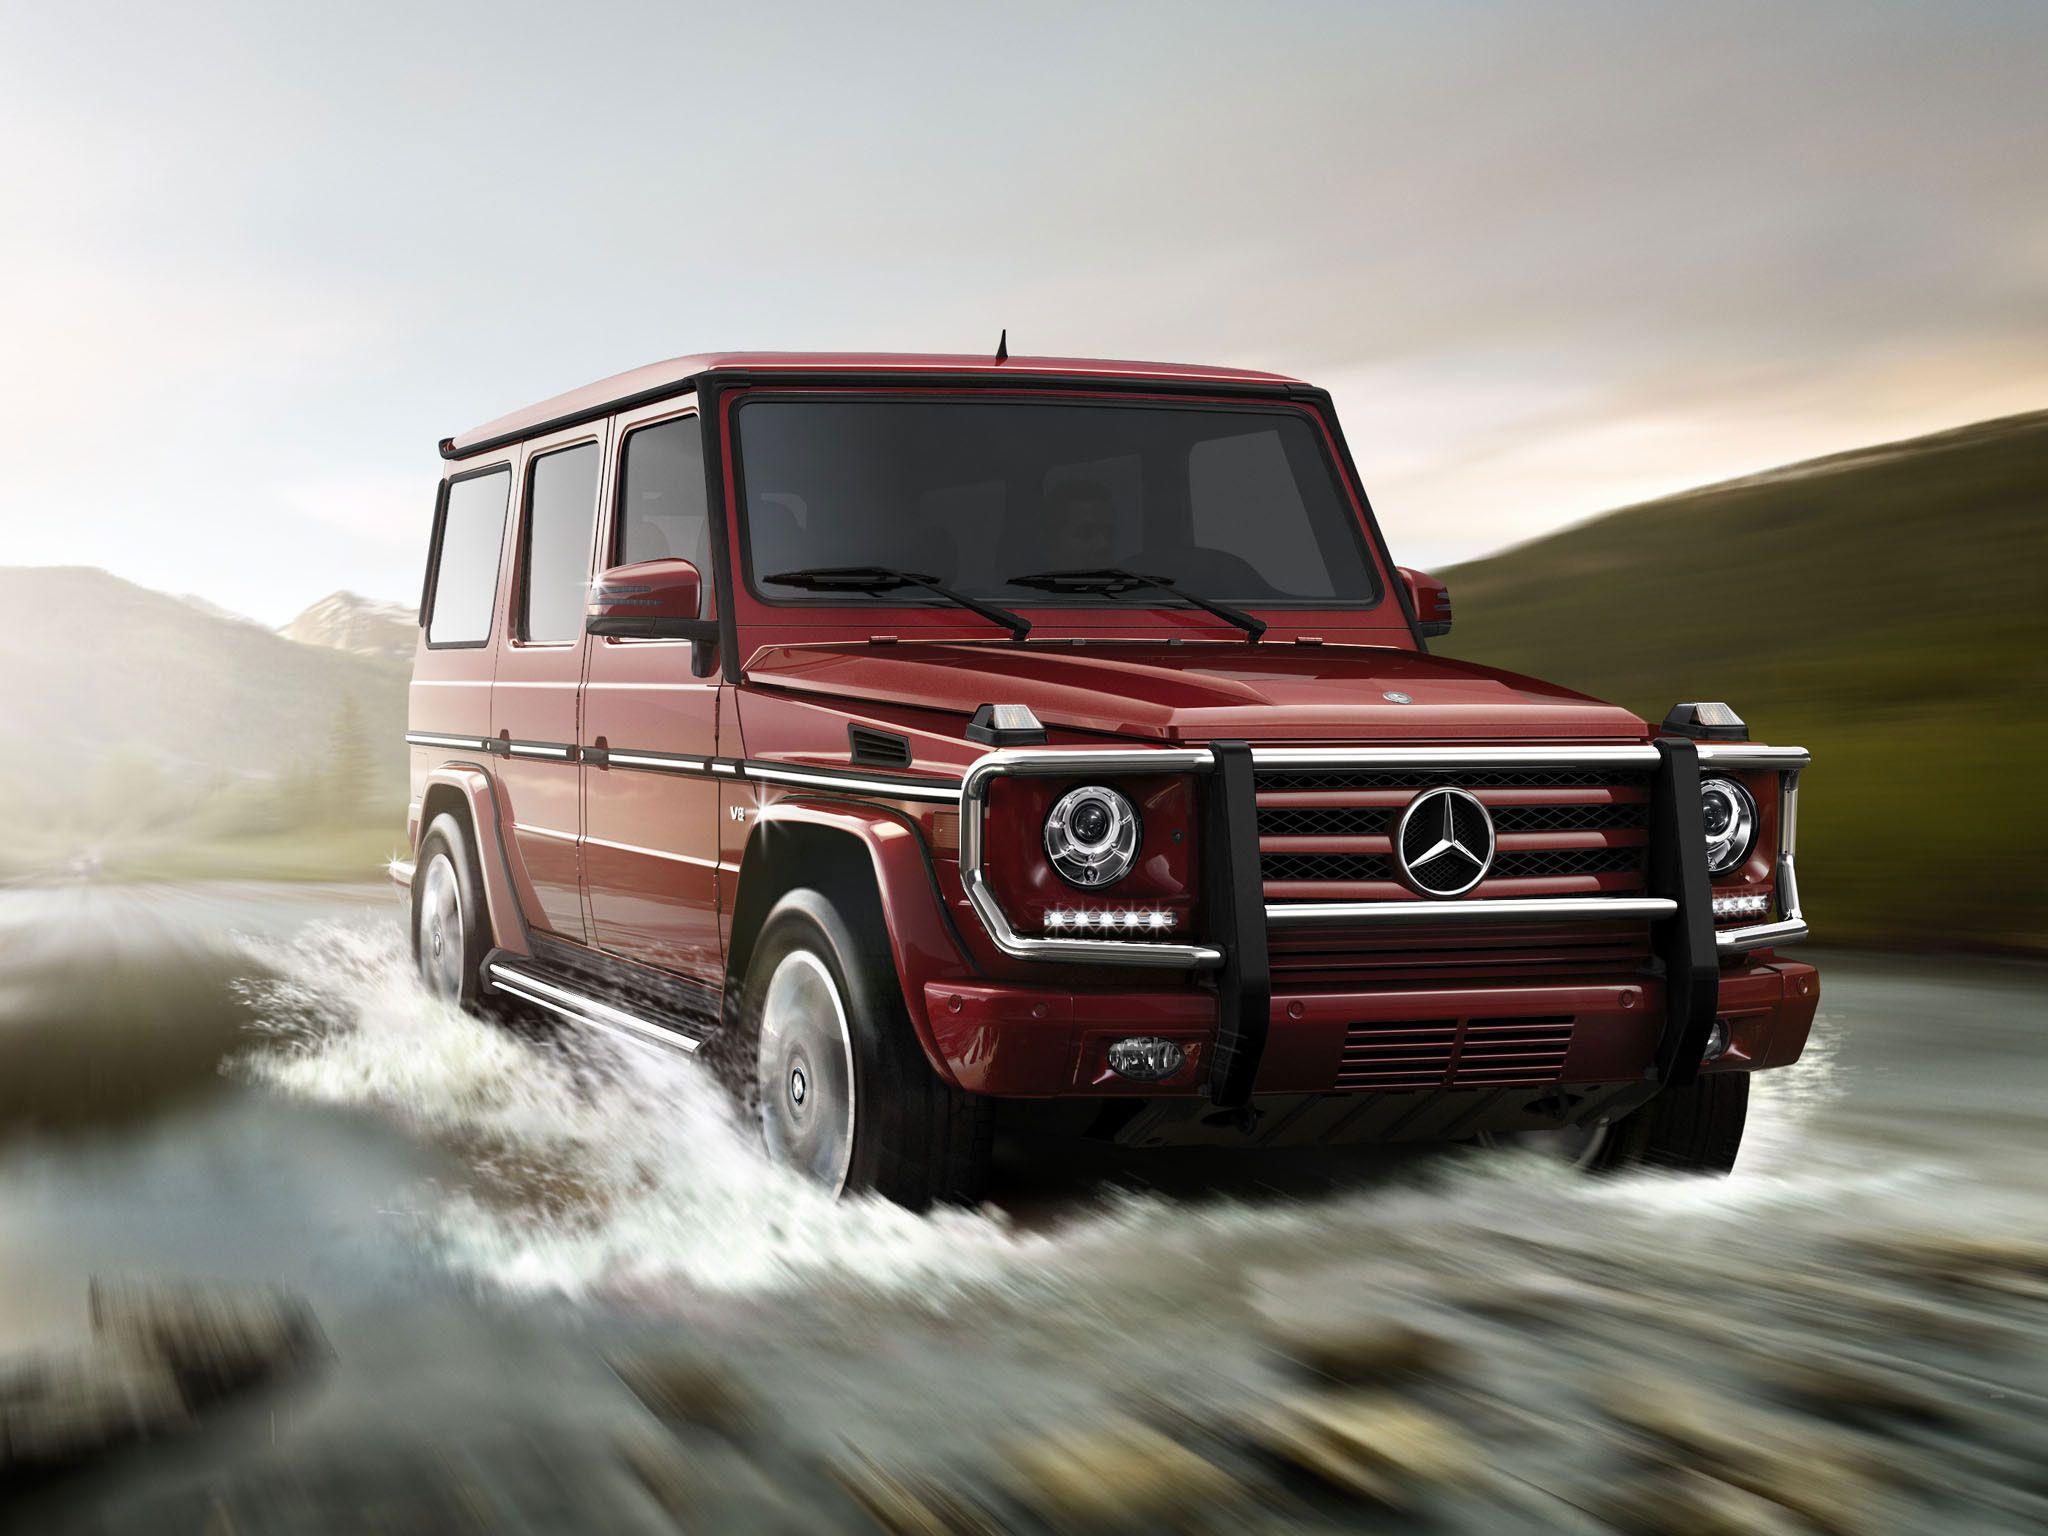 2013 mercedes benz g550 in storm red metallic - 2013 Mercedes Benz G550